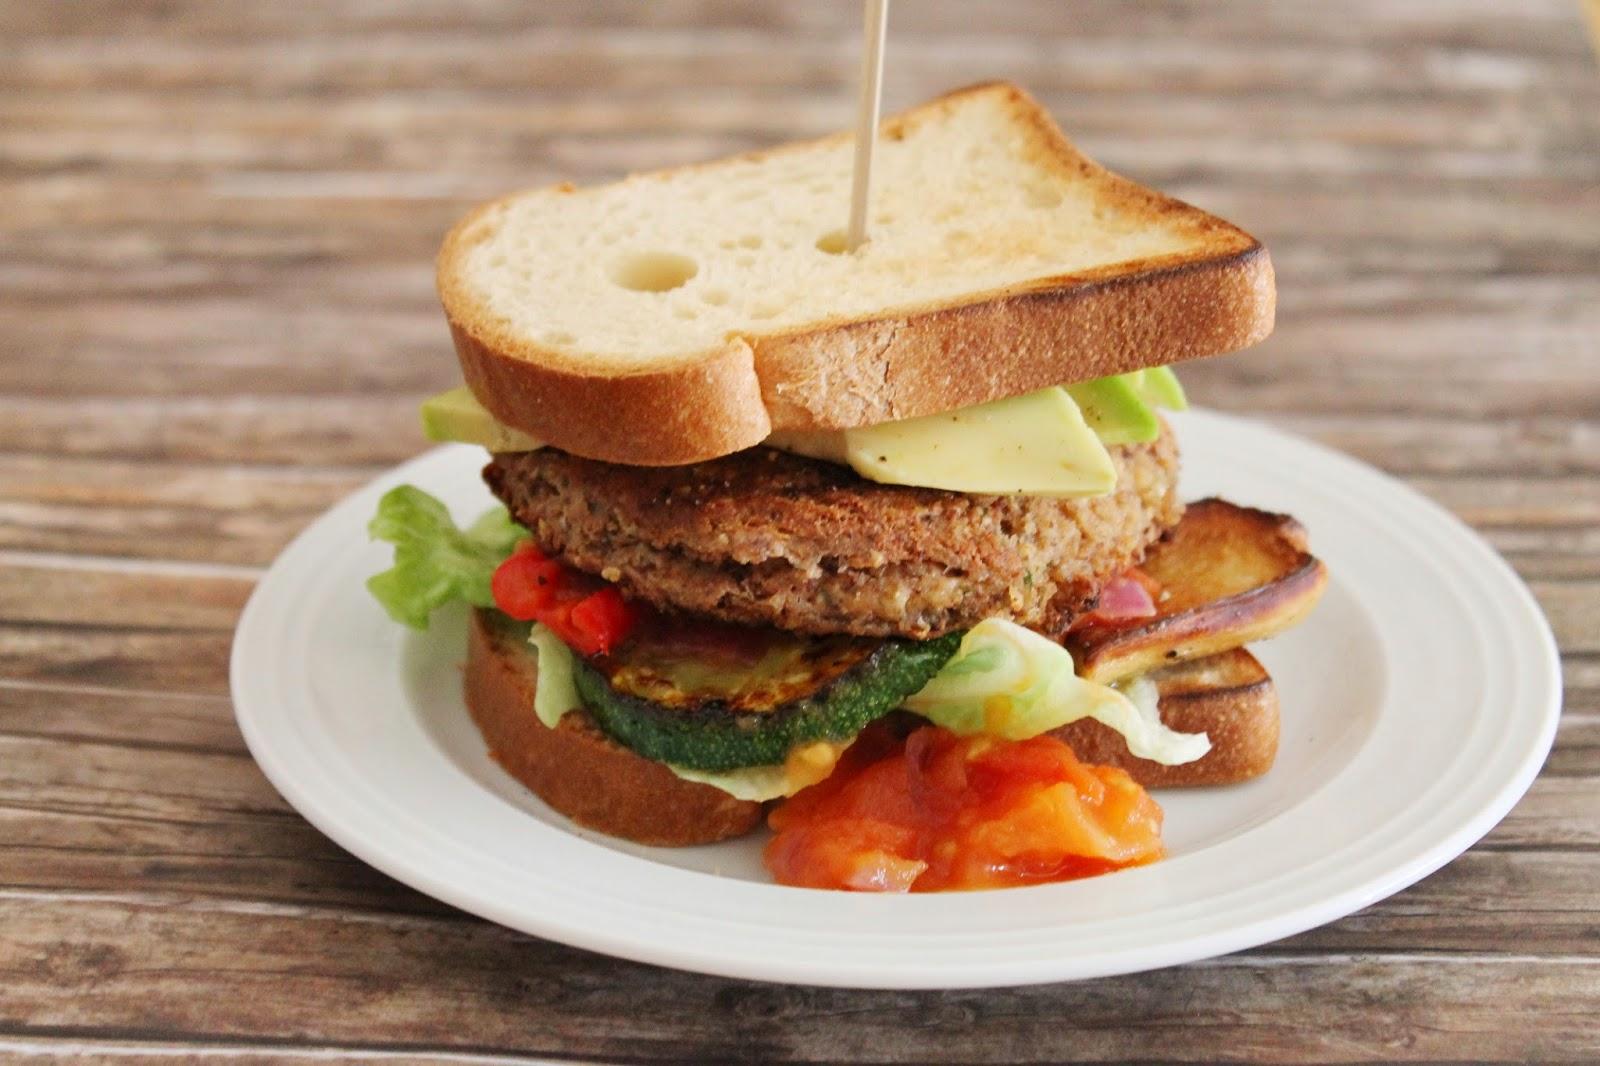 Glutenfreier vegetarischer Burger